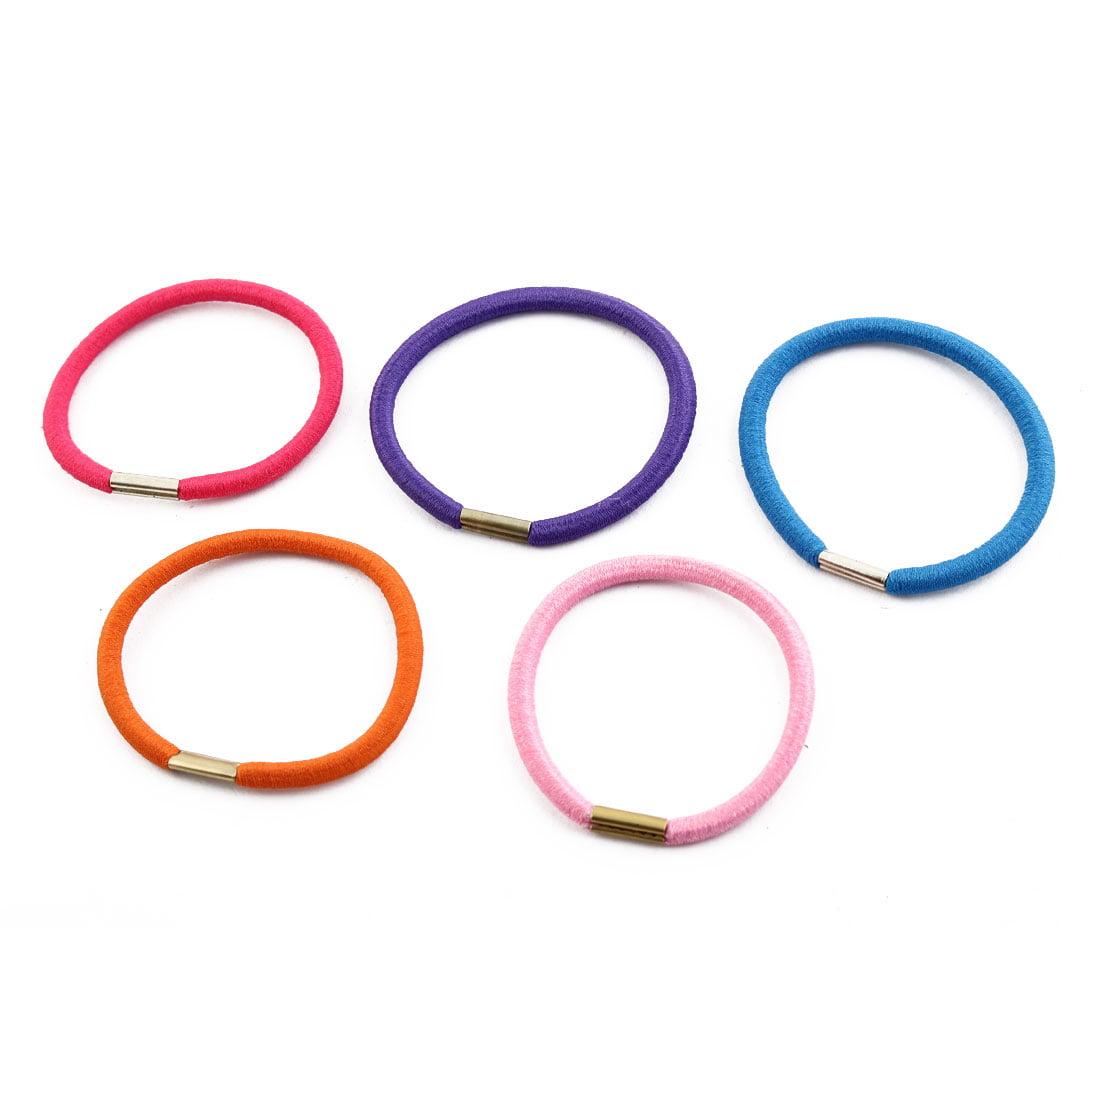 Women Lady Elastic Rubber Hair Tie Band Haristyle Holder Assorted Color 40 Pcs - image 1 de 4